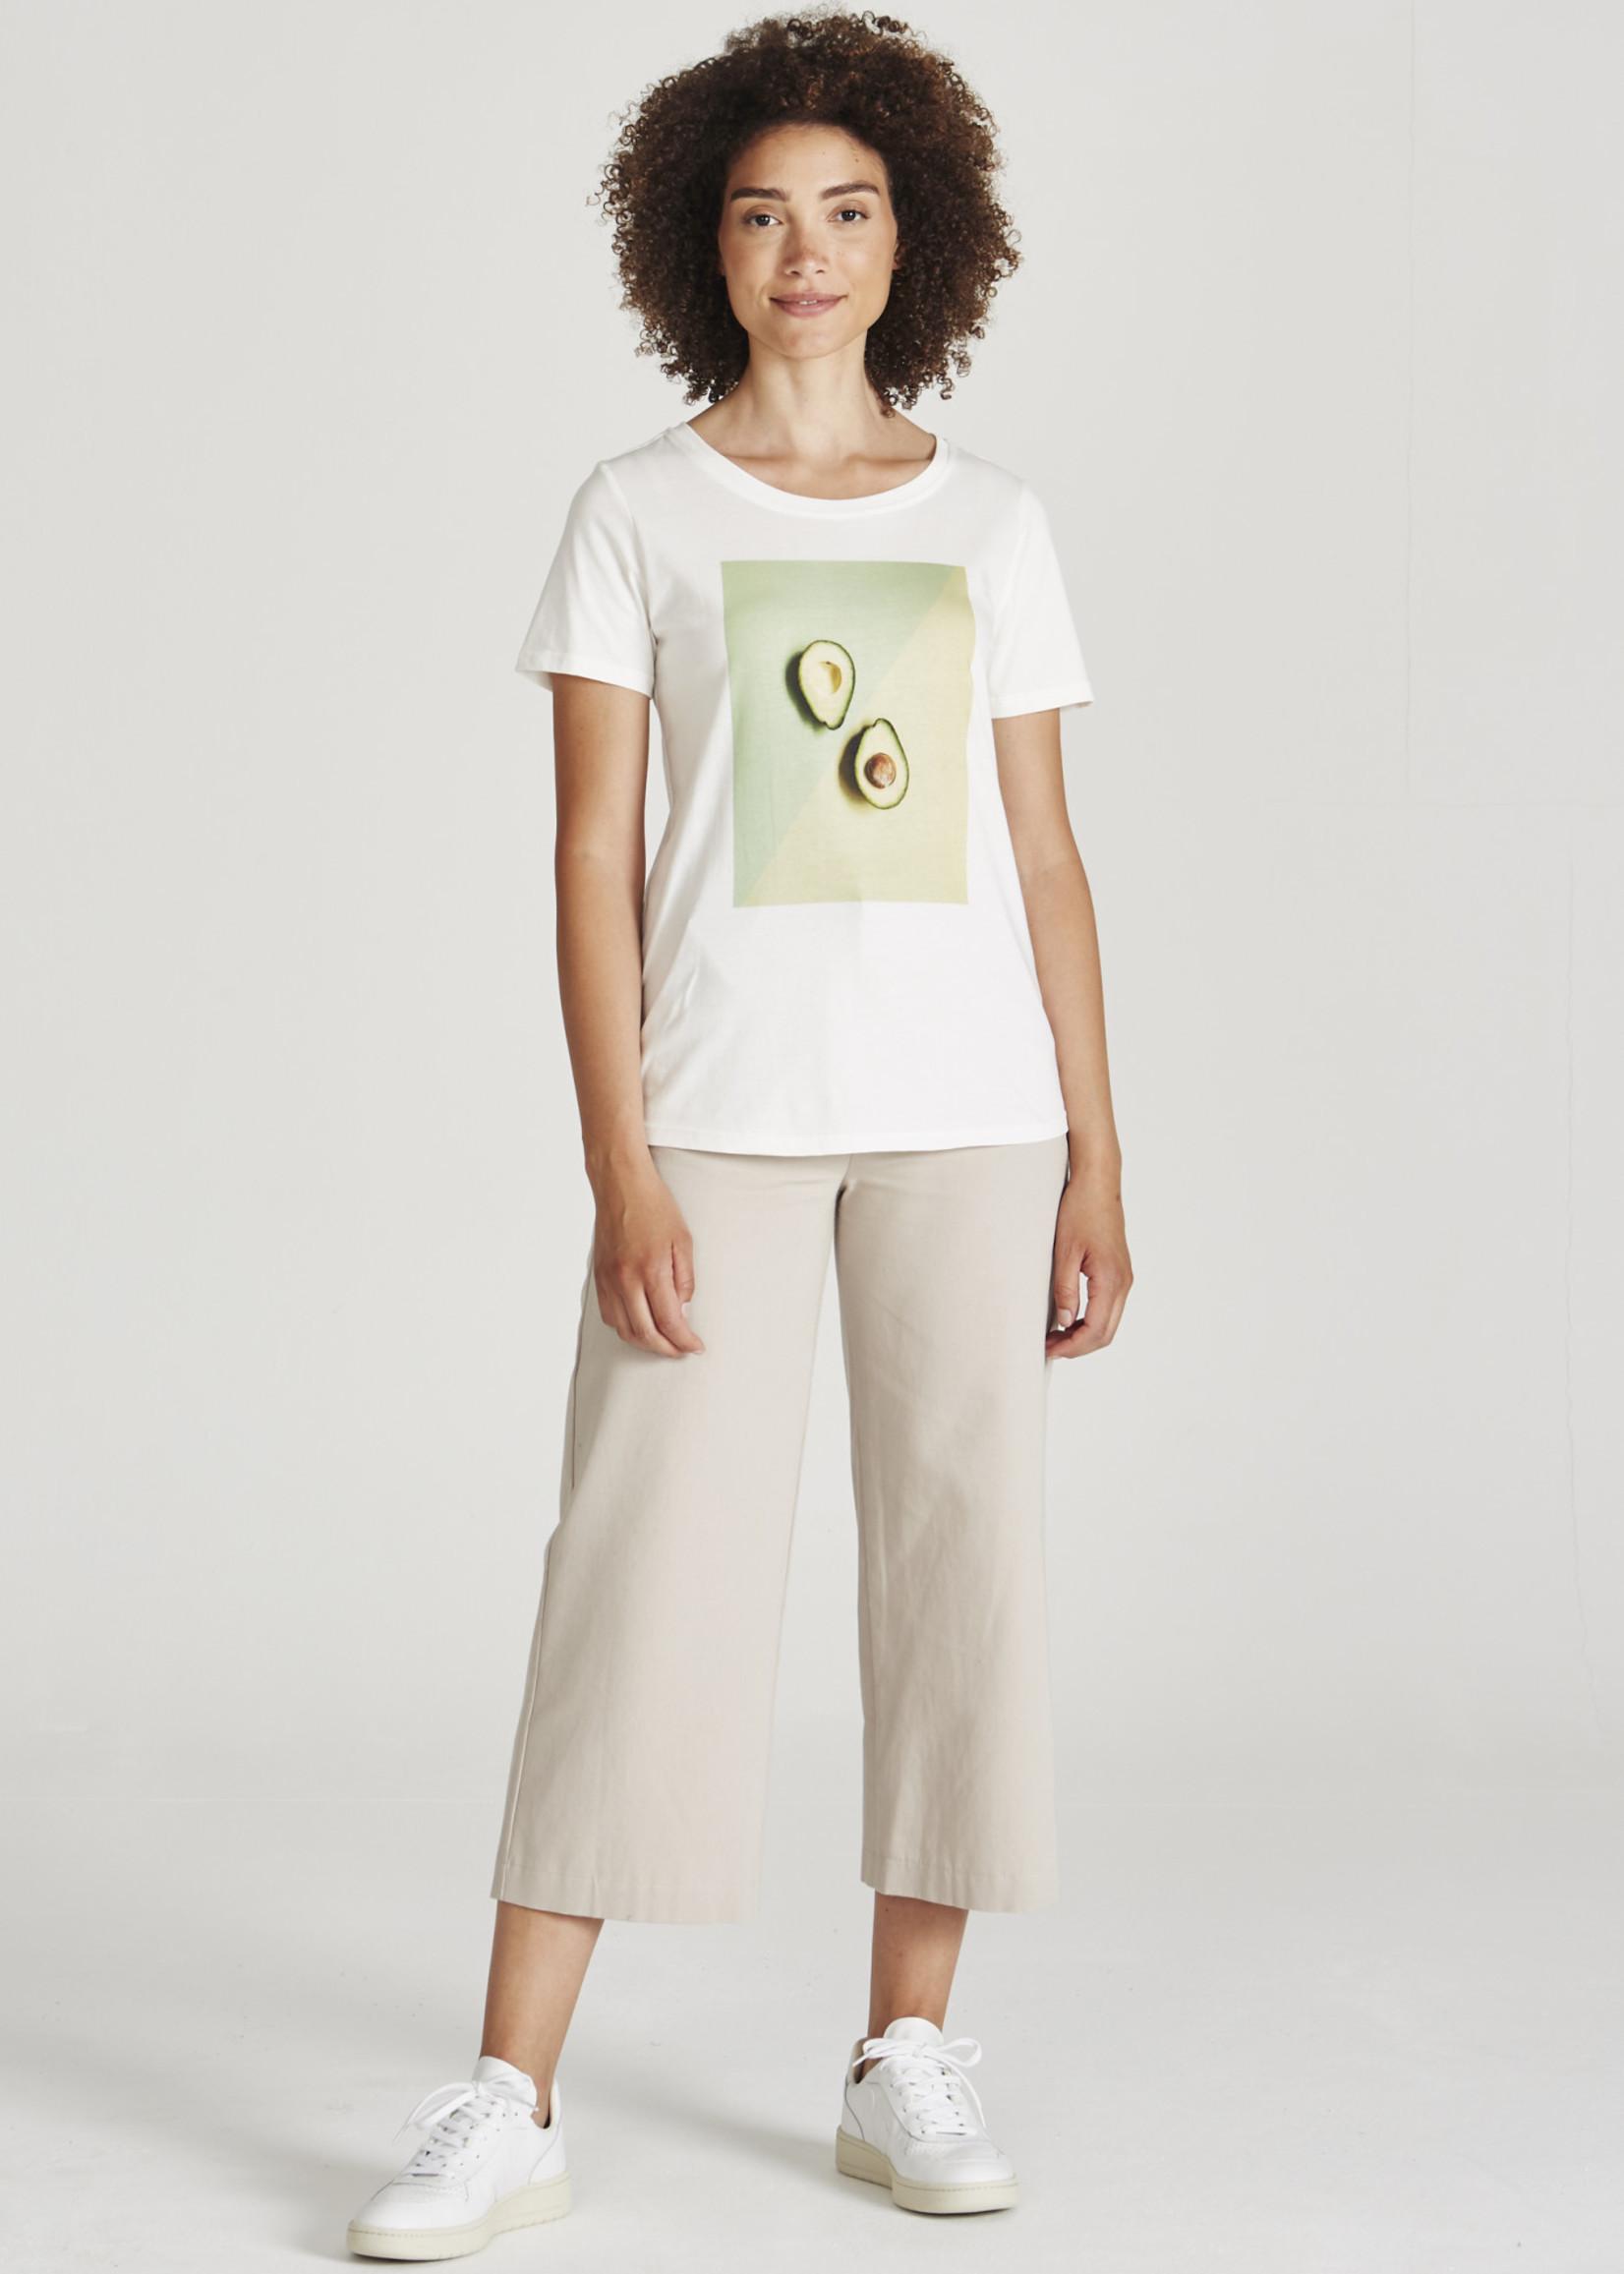 Givn Lena T-shirt (avocado print)